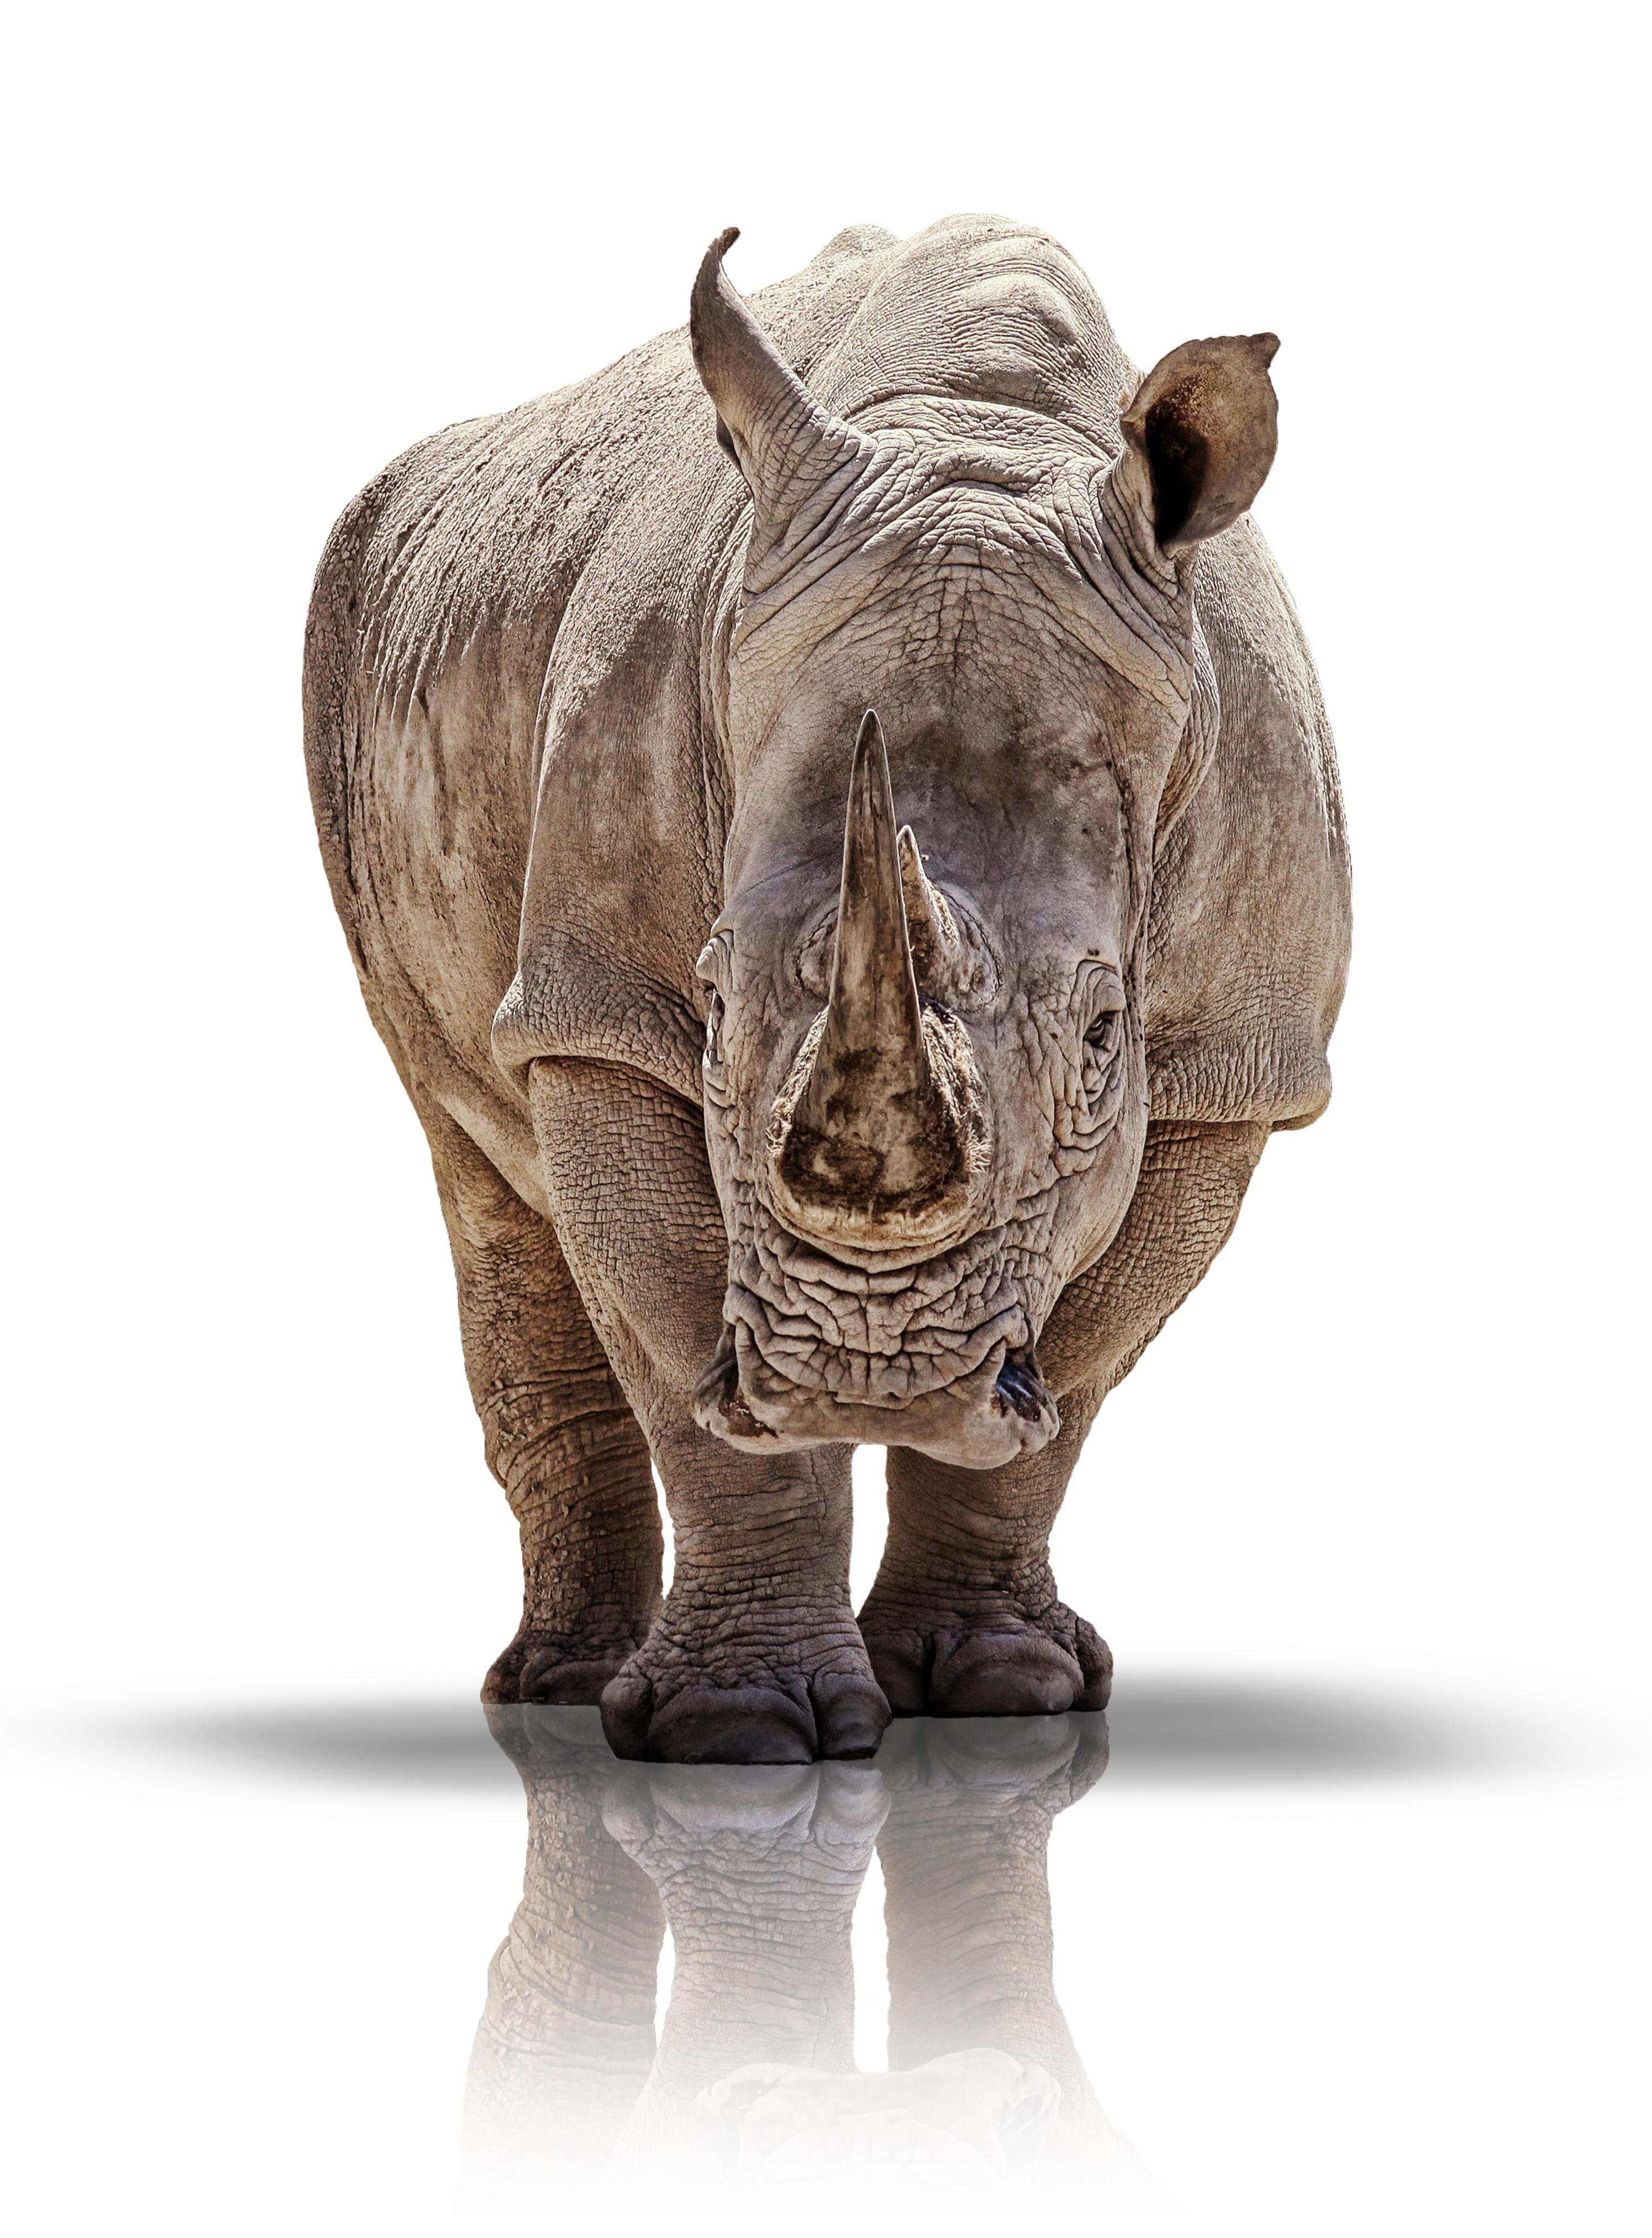 http://www.dreamstime.com/stock-photos-white-rhino-image27988293